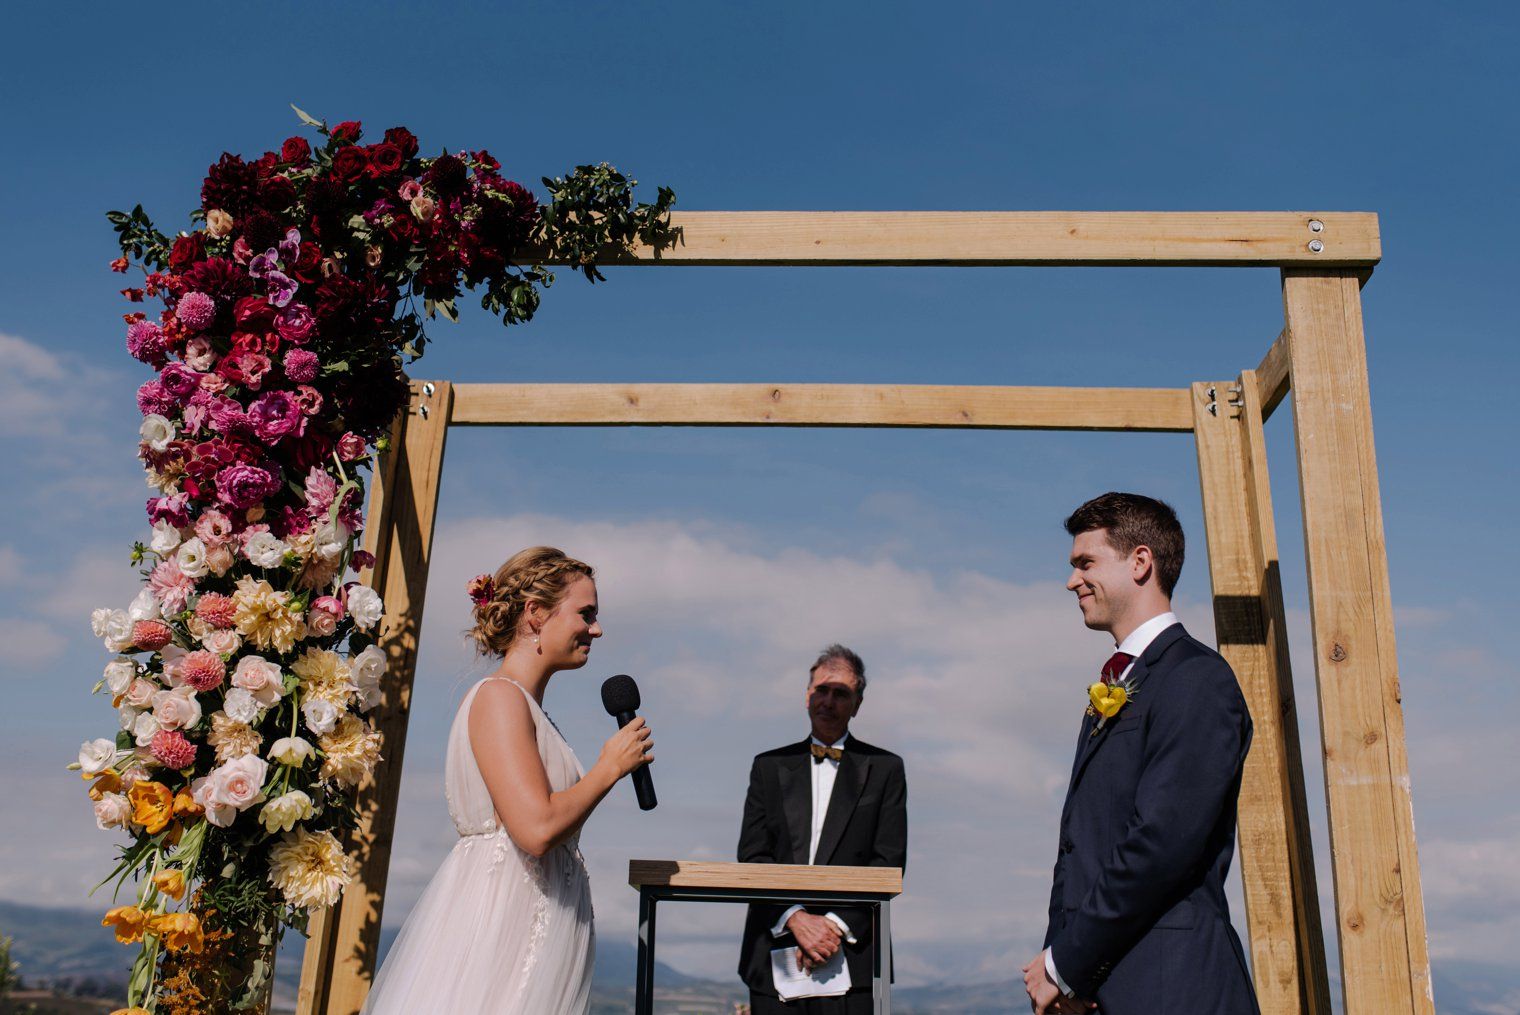 outdoor wedding venue in stellenbosch